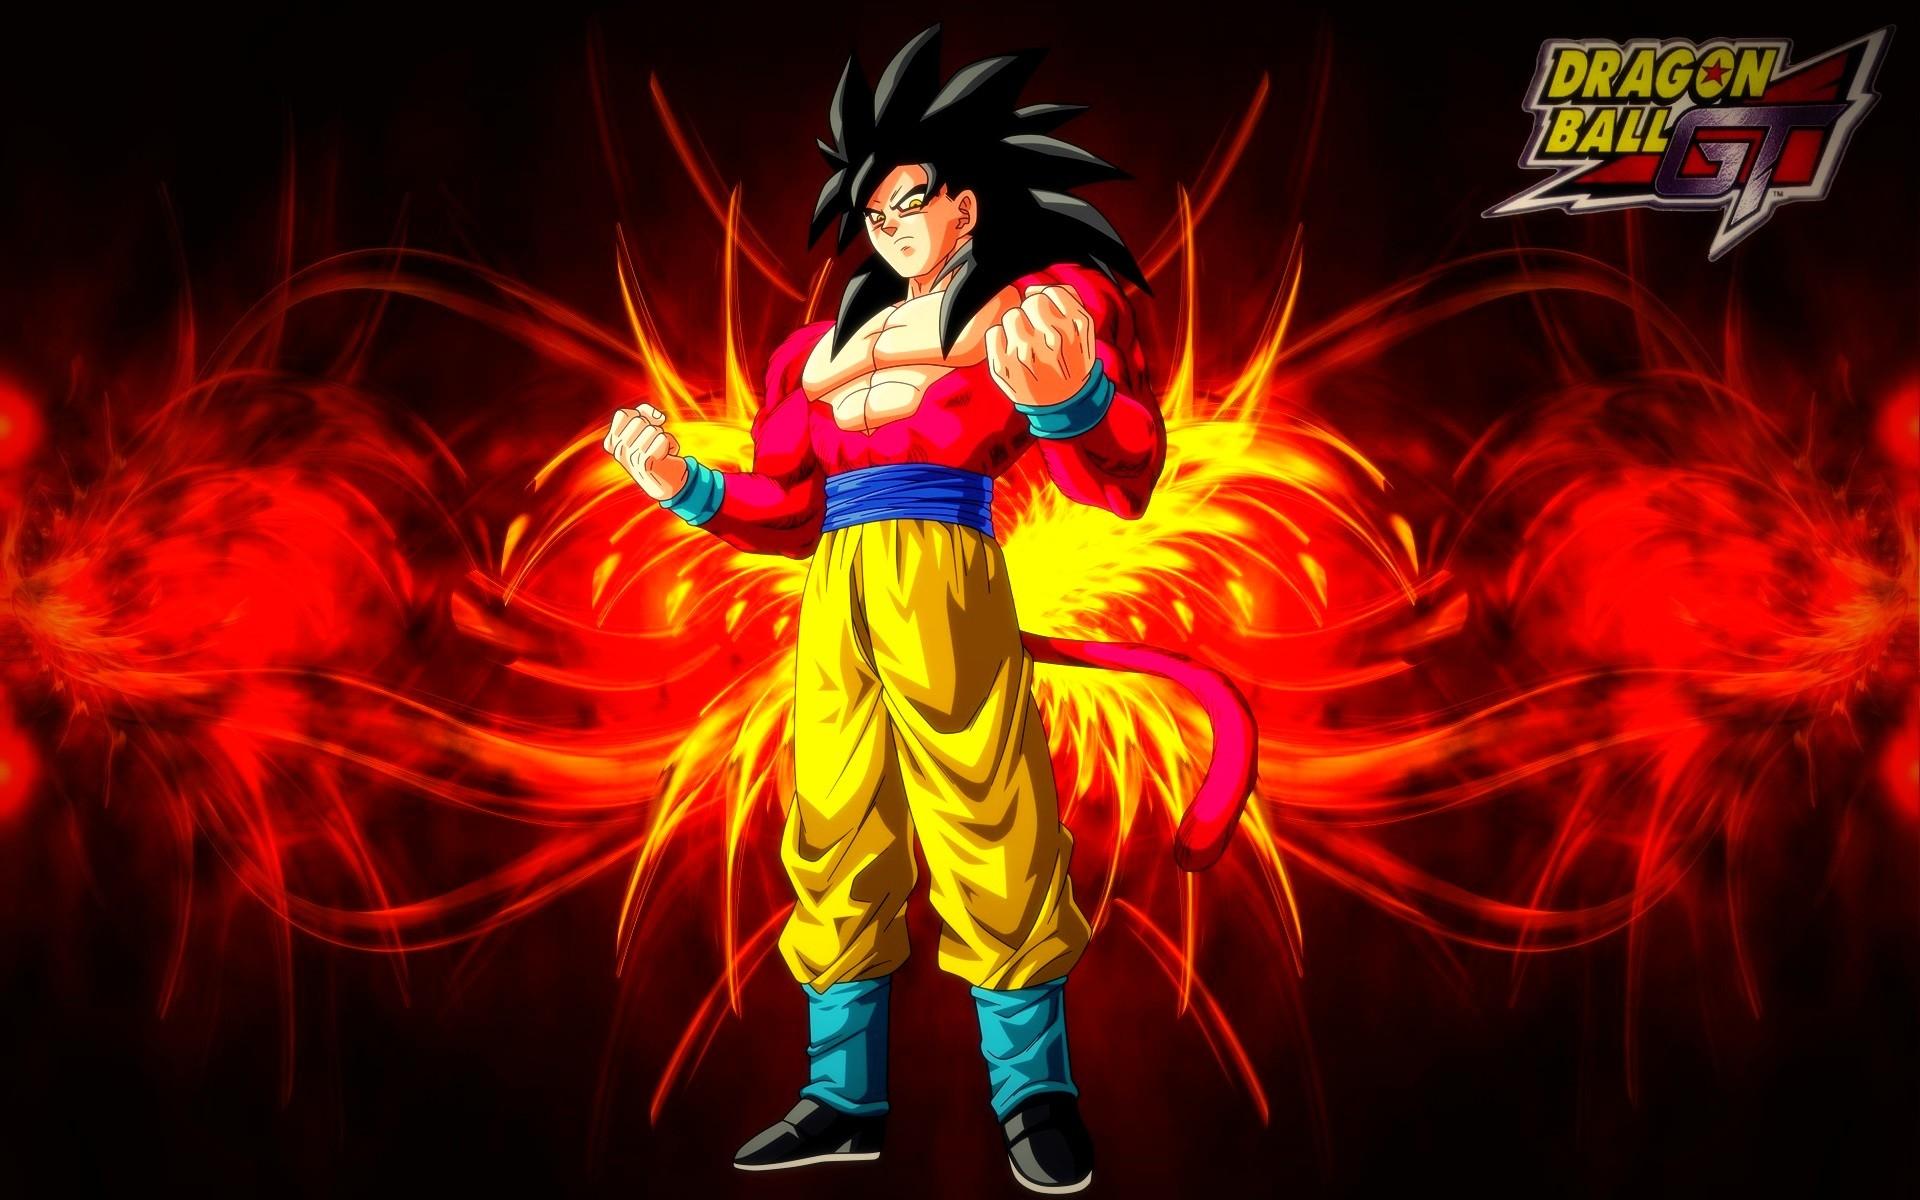 Goku Super Saiyan 4 Wallpaper 66 images 1920x1200